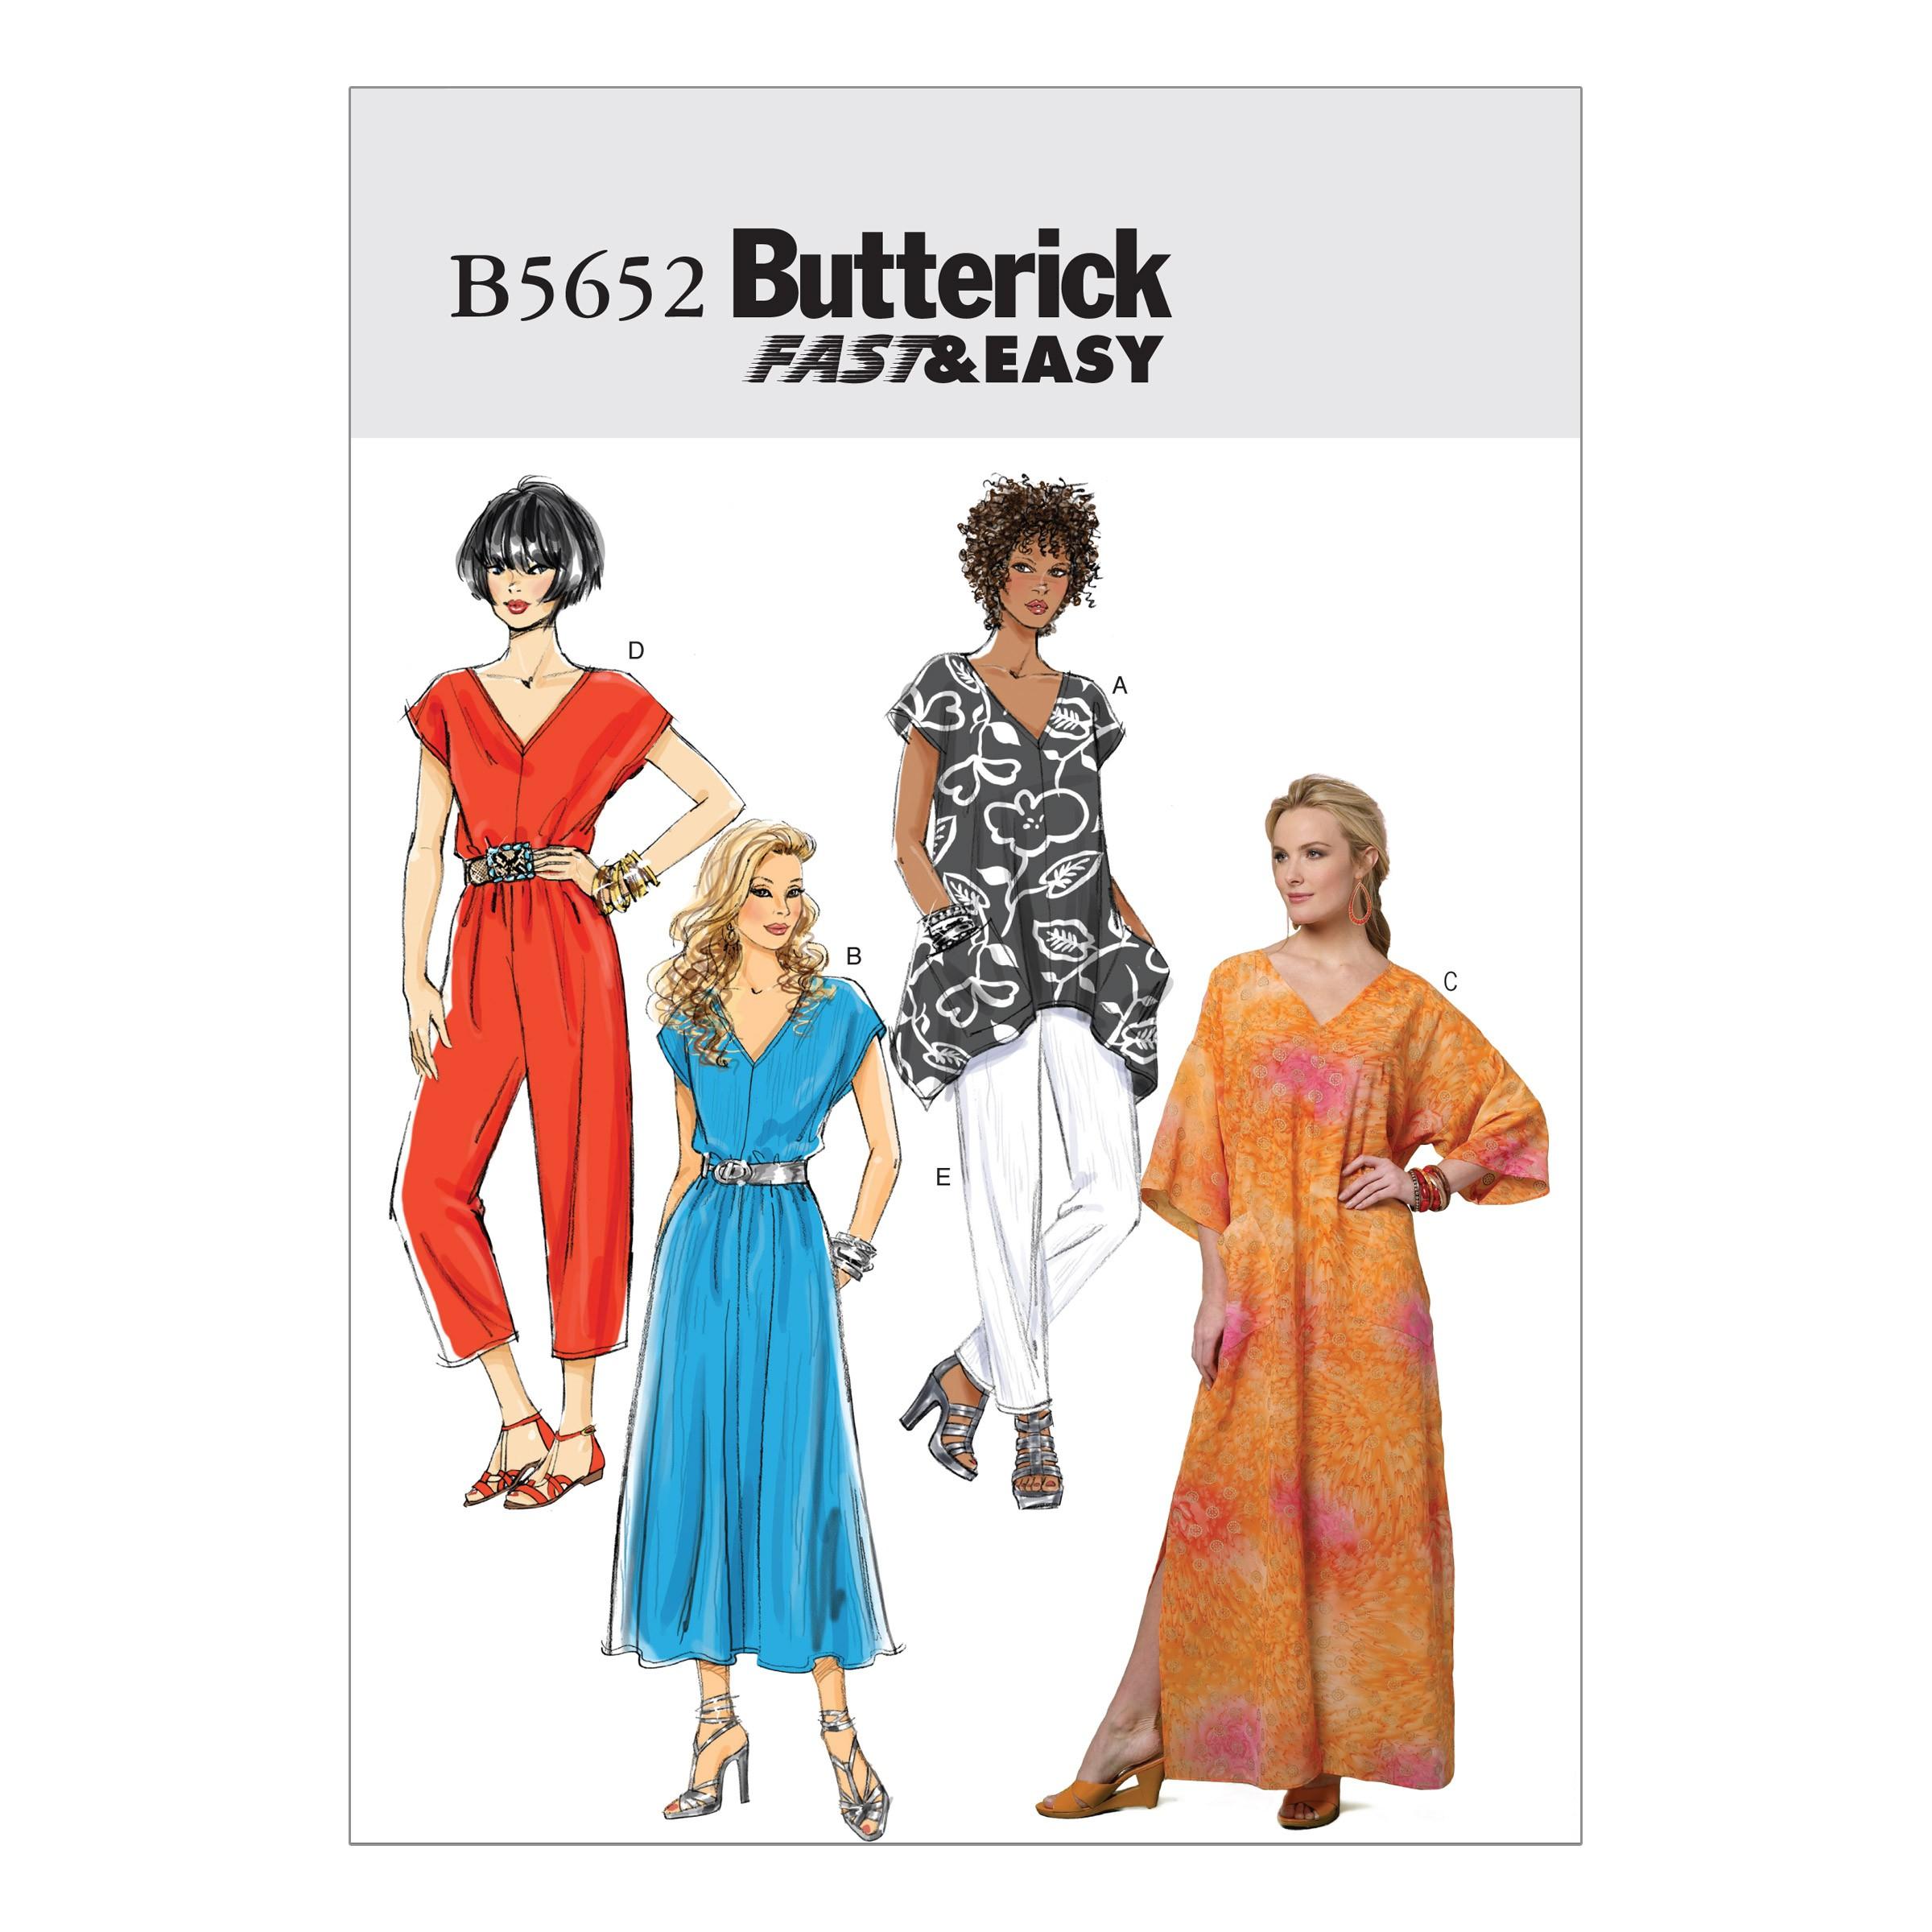 Butterick Sewing Pattern 5652 Misses' Top Dress Caftan Jumpsuit & Trousers